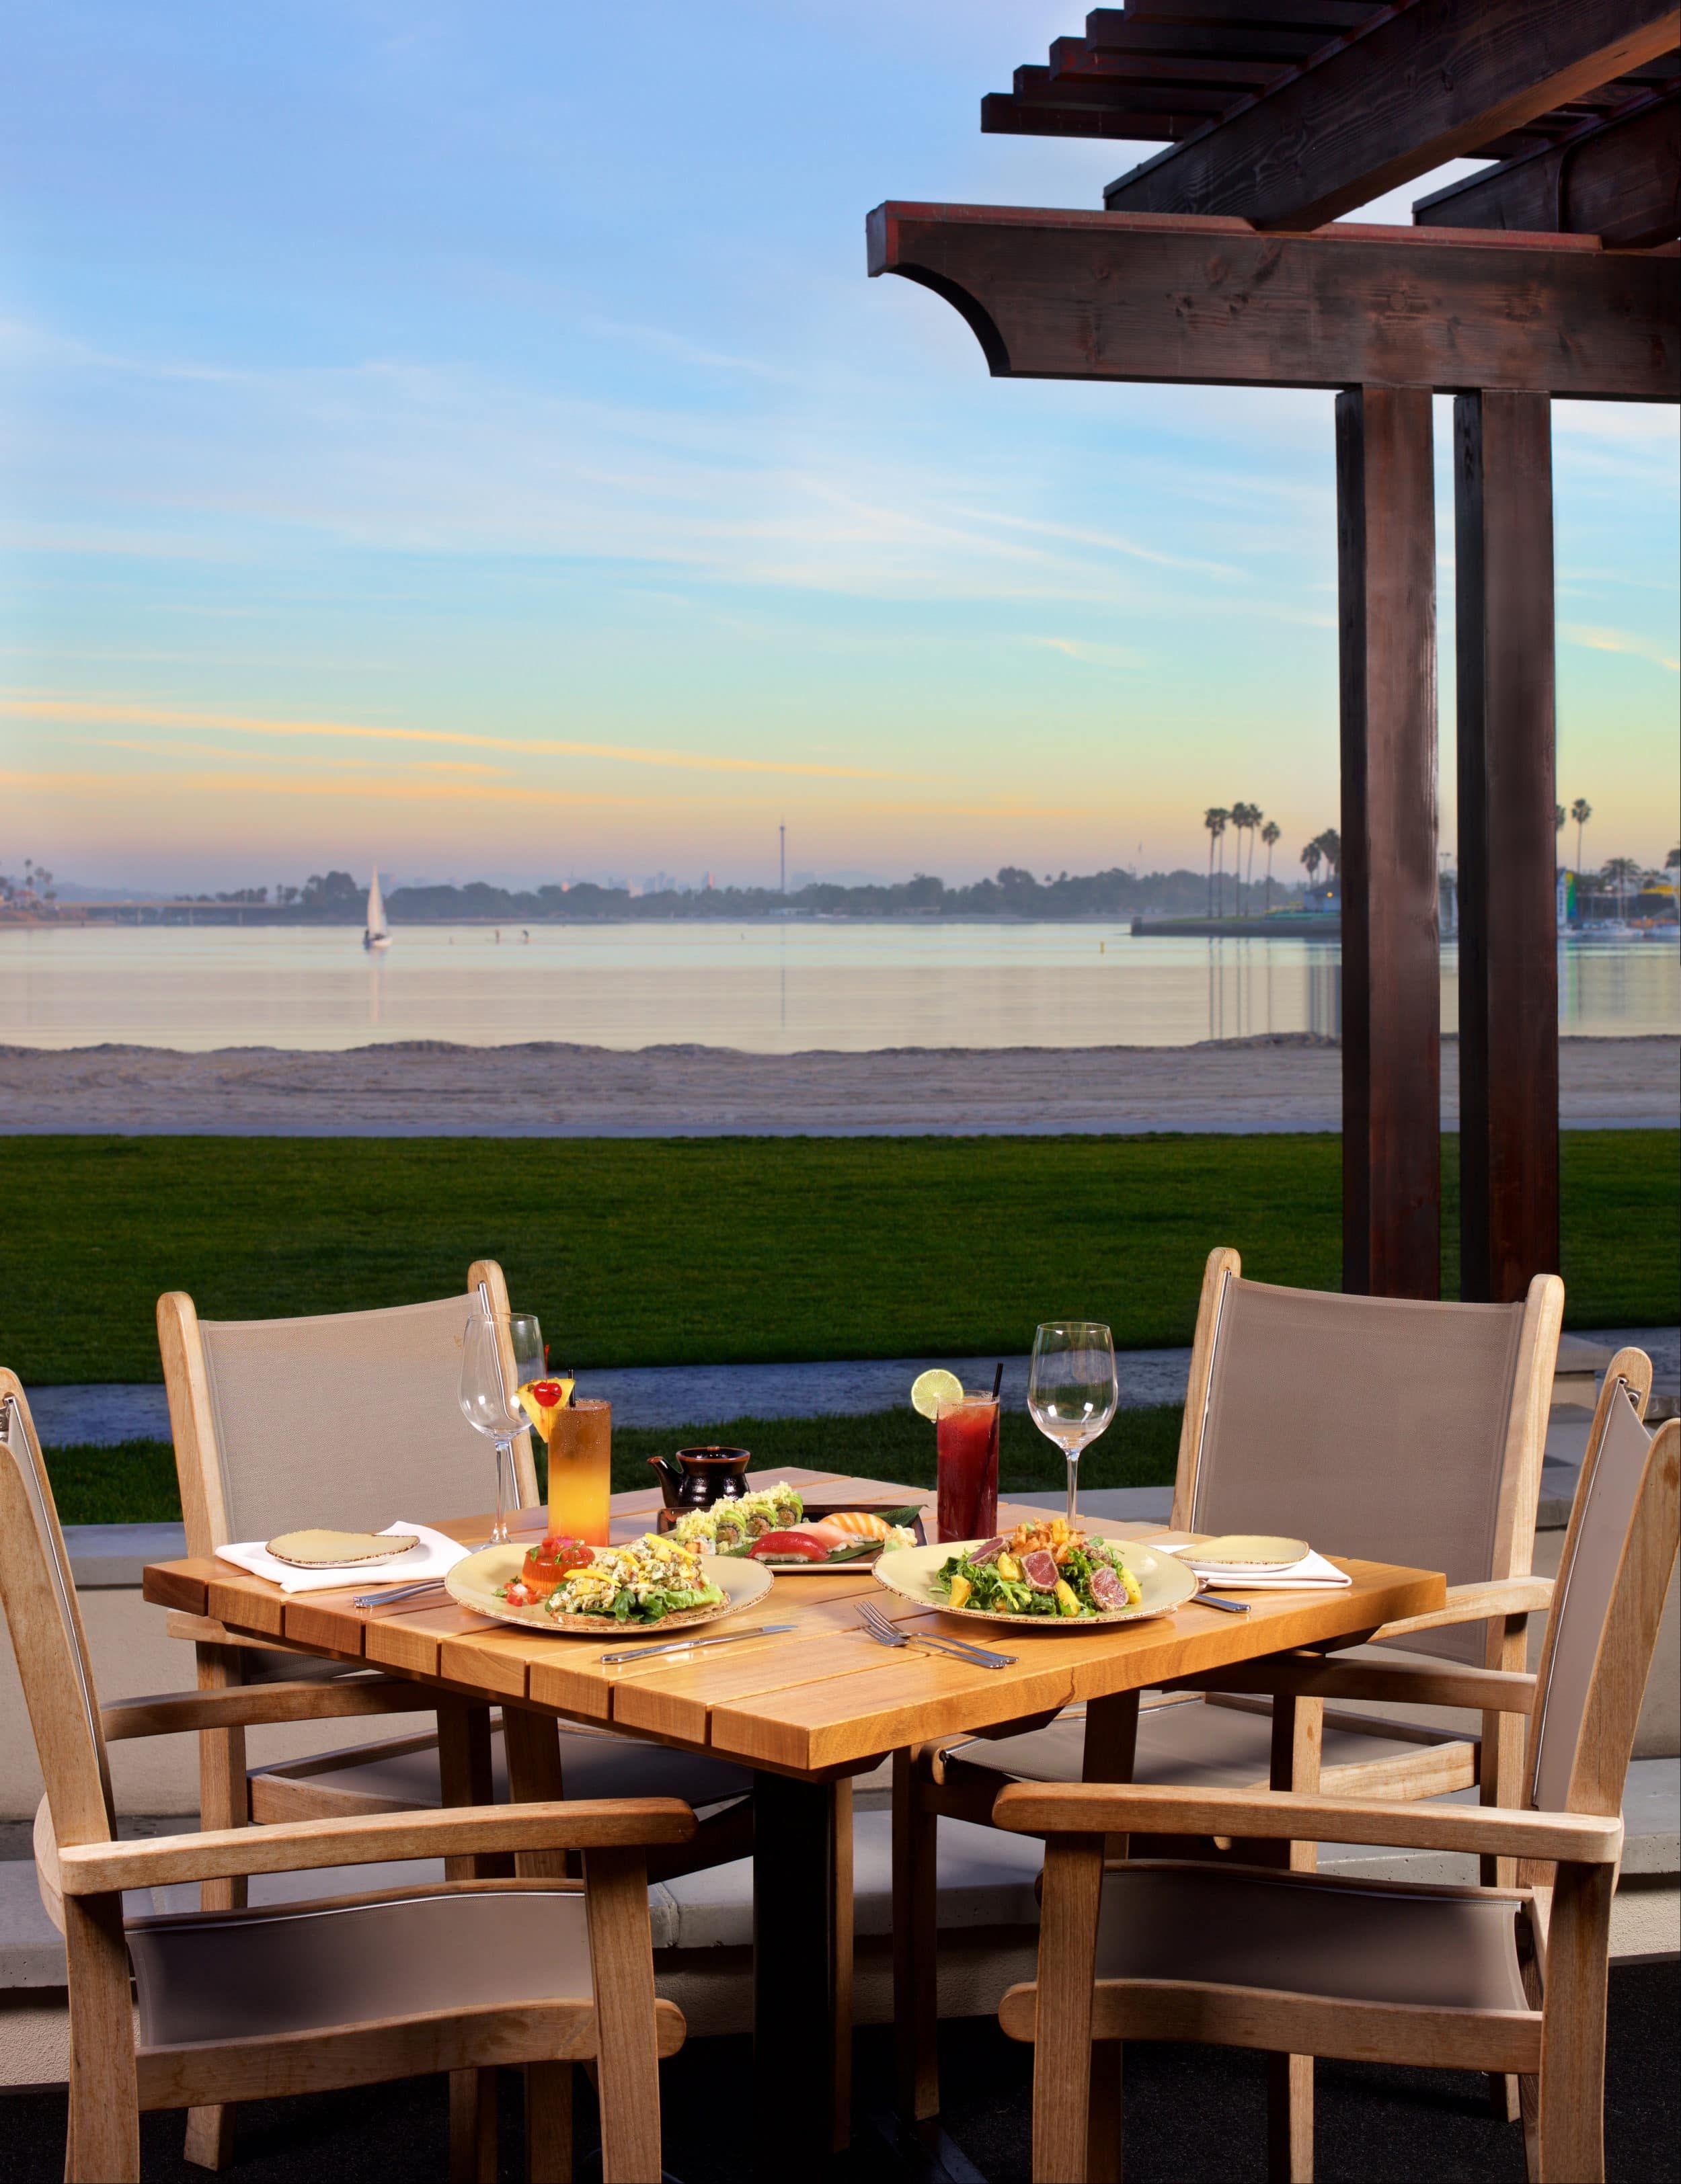 Catamaran Resort Hotel and Spa | San Diego | San diego beach